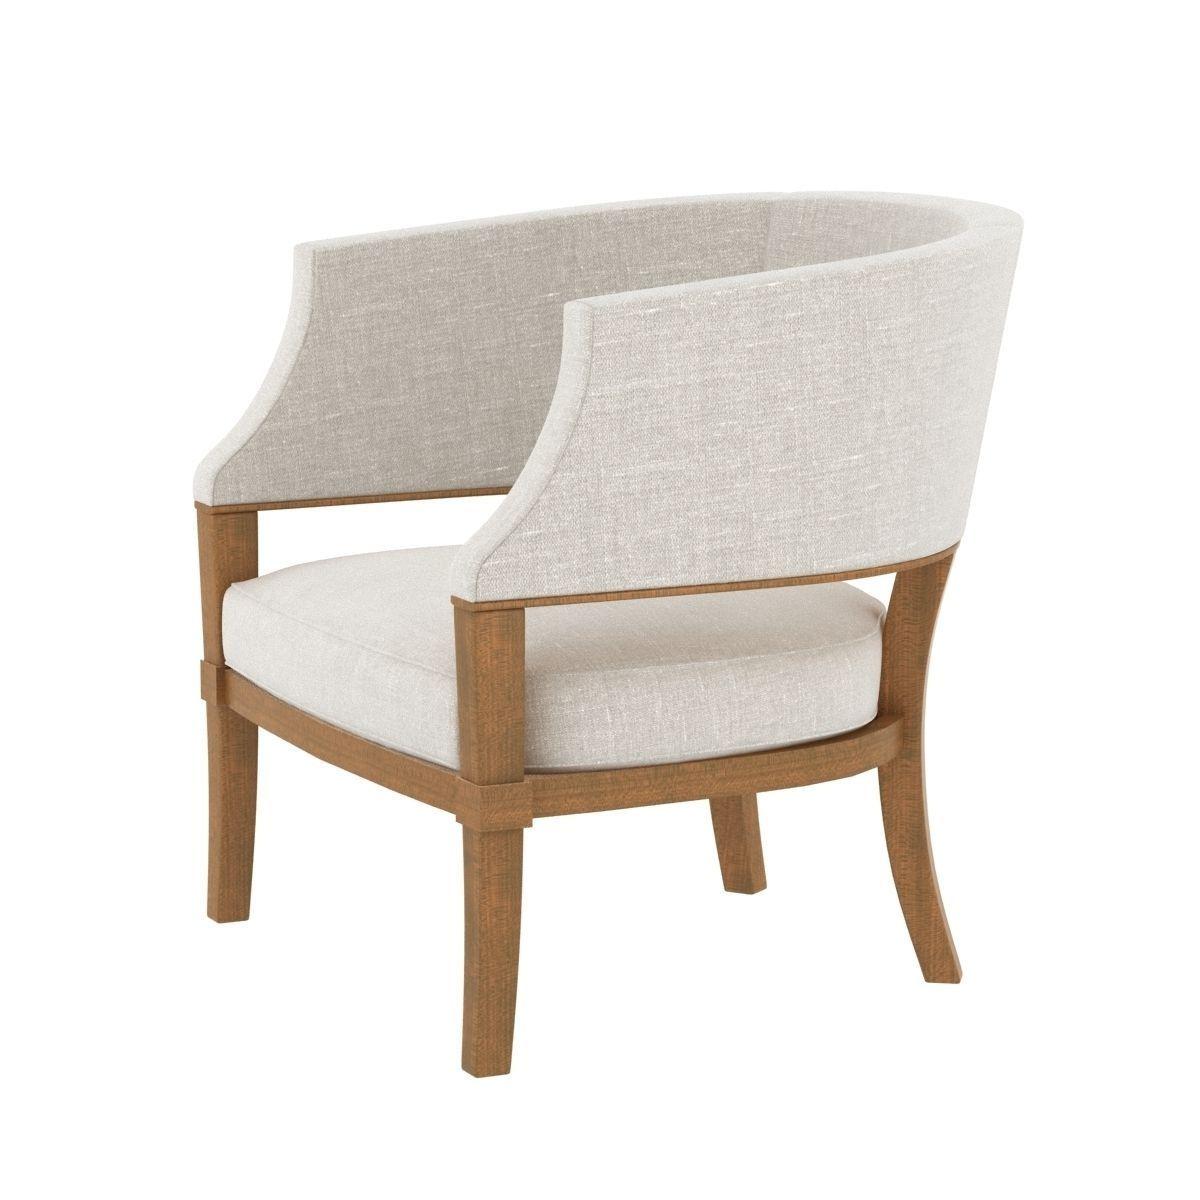 Holly Hunt South Beach Chair 3d Model Max Obj 3ds Fbx